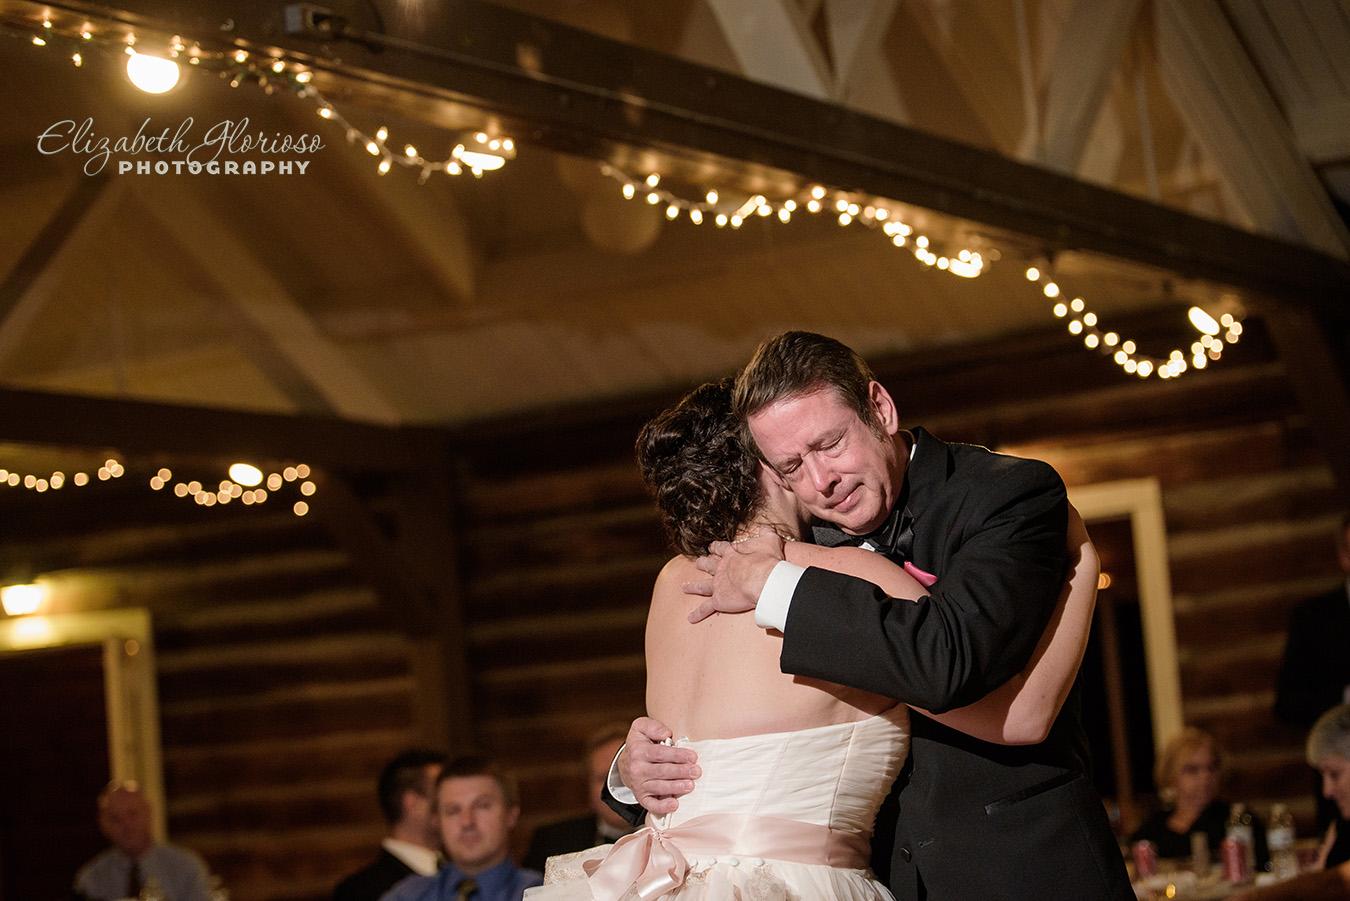 Vermilion_wedding_Glorioso Photography_1046